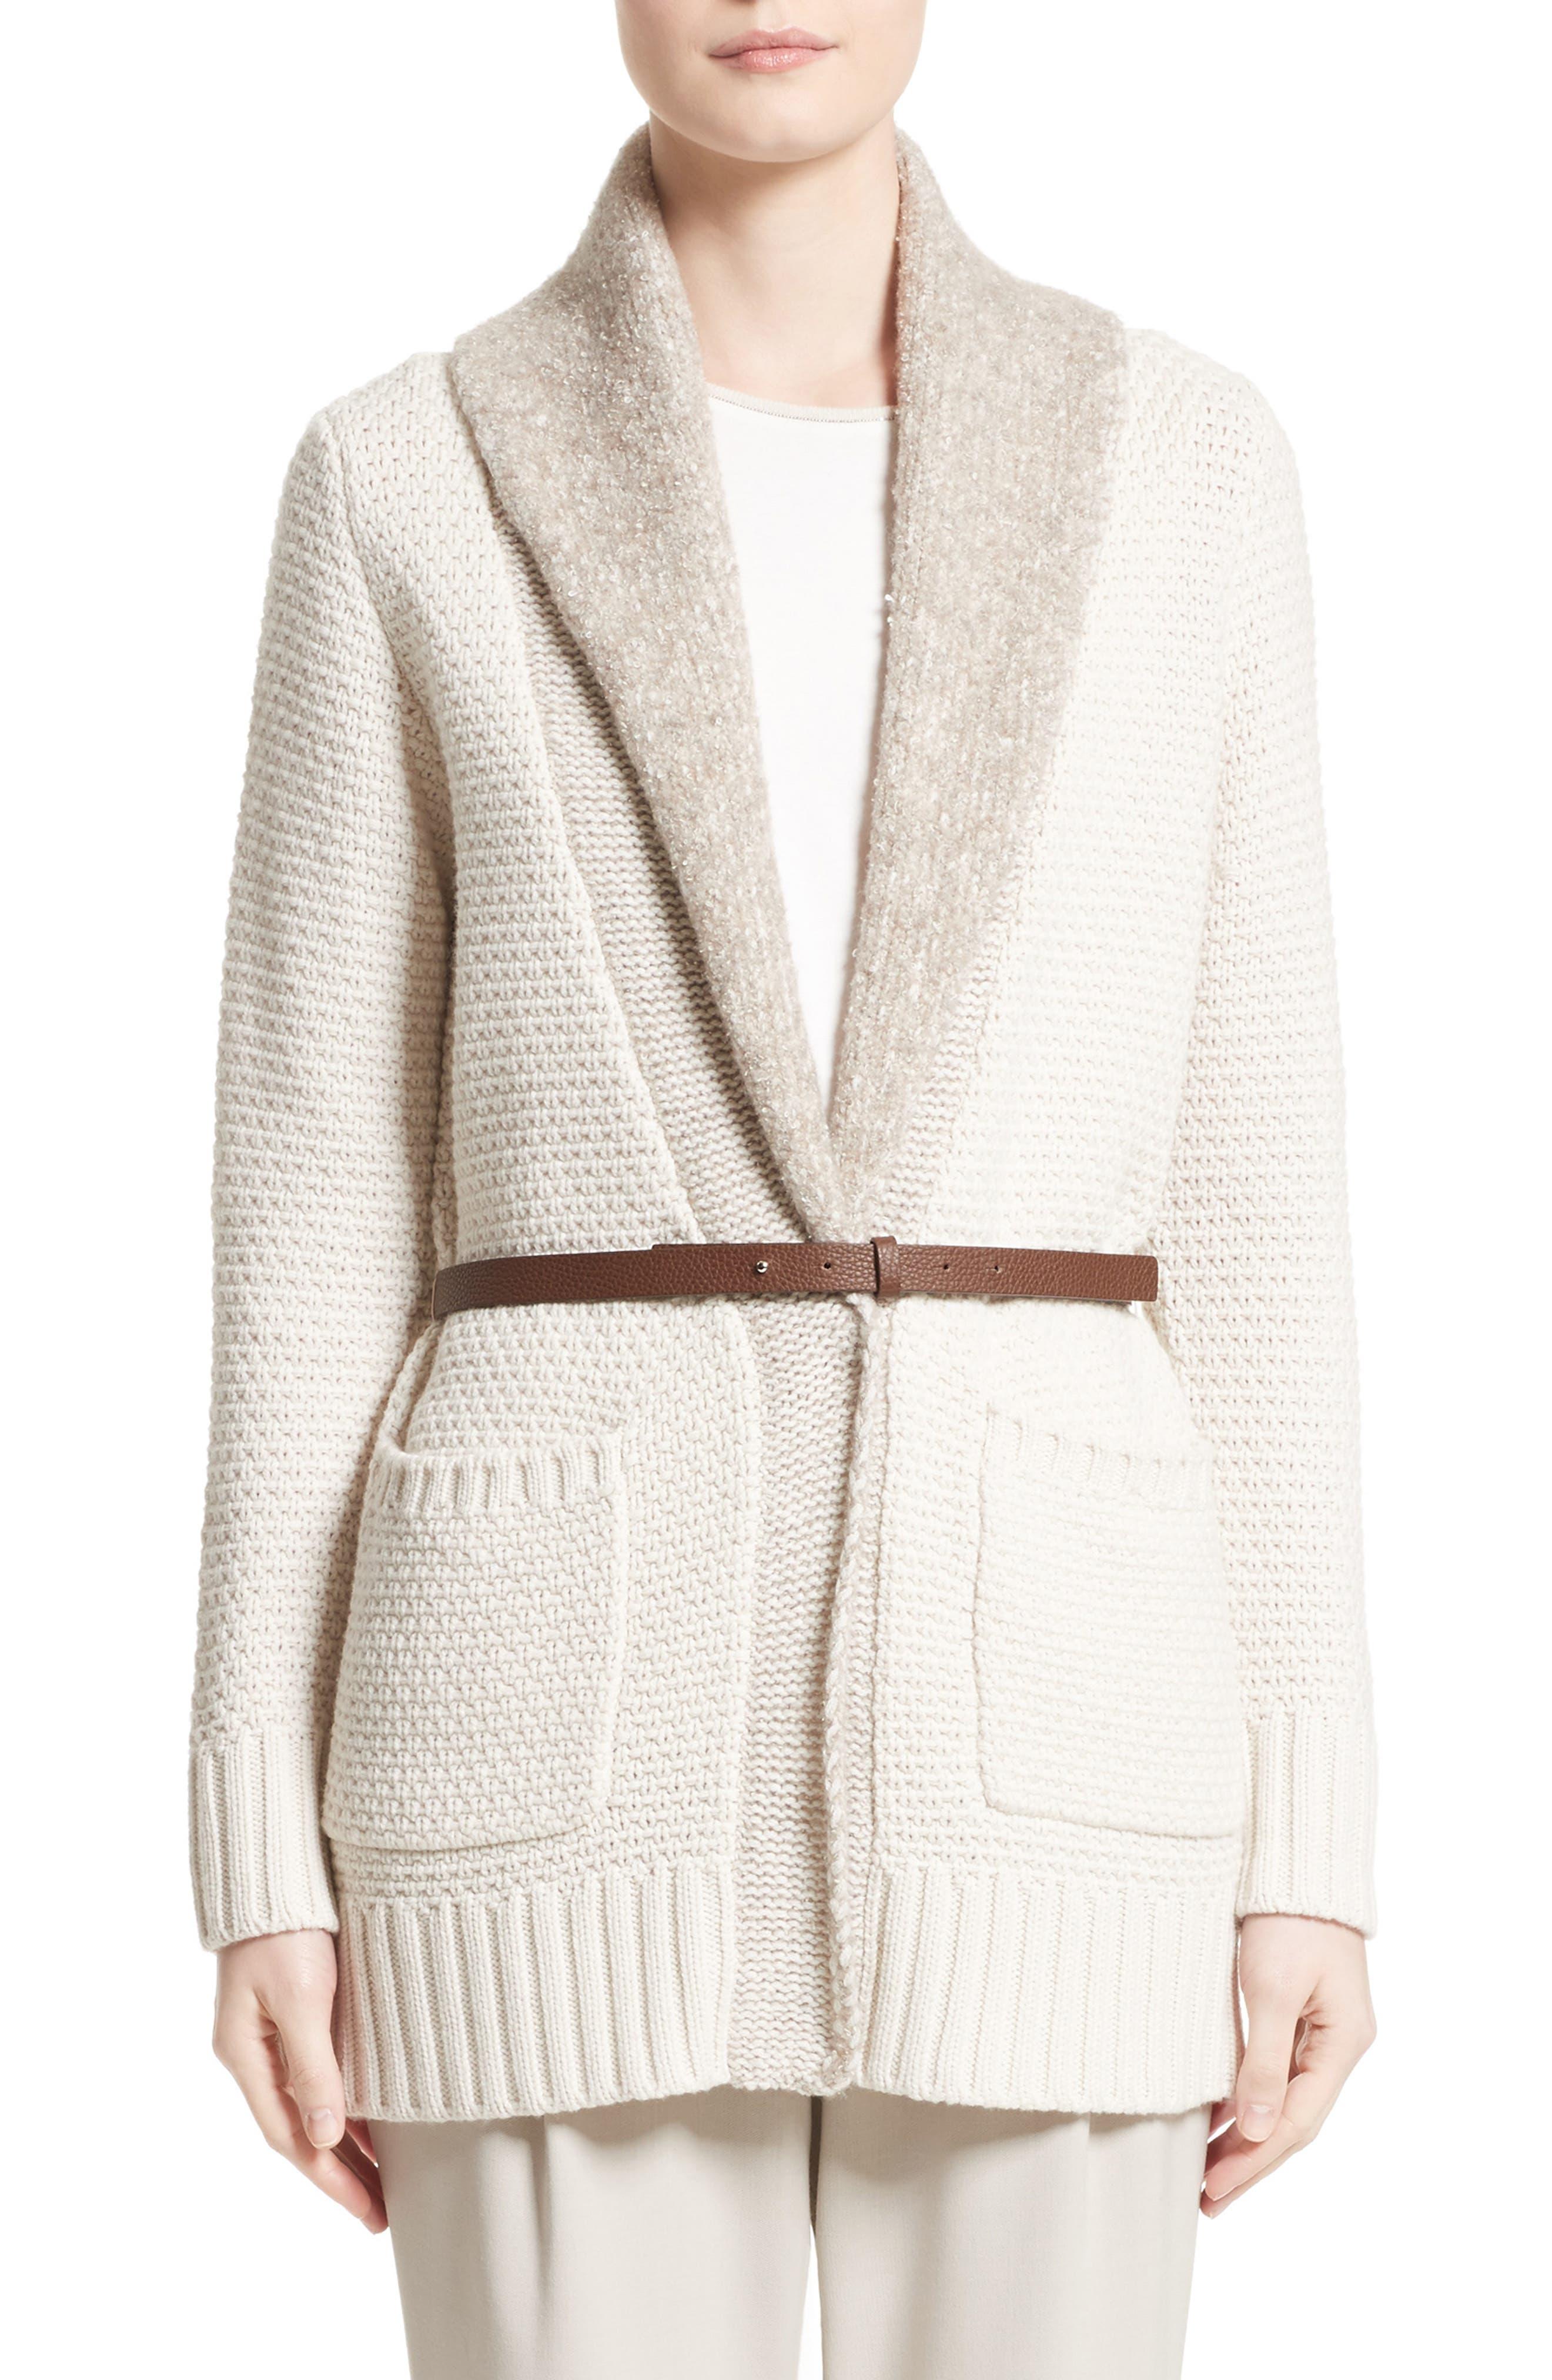 Wool, Silk & Cashmere Knit Cardigan,                             Main thumbnail 1, color,                             101